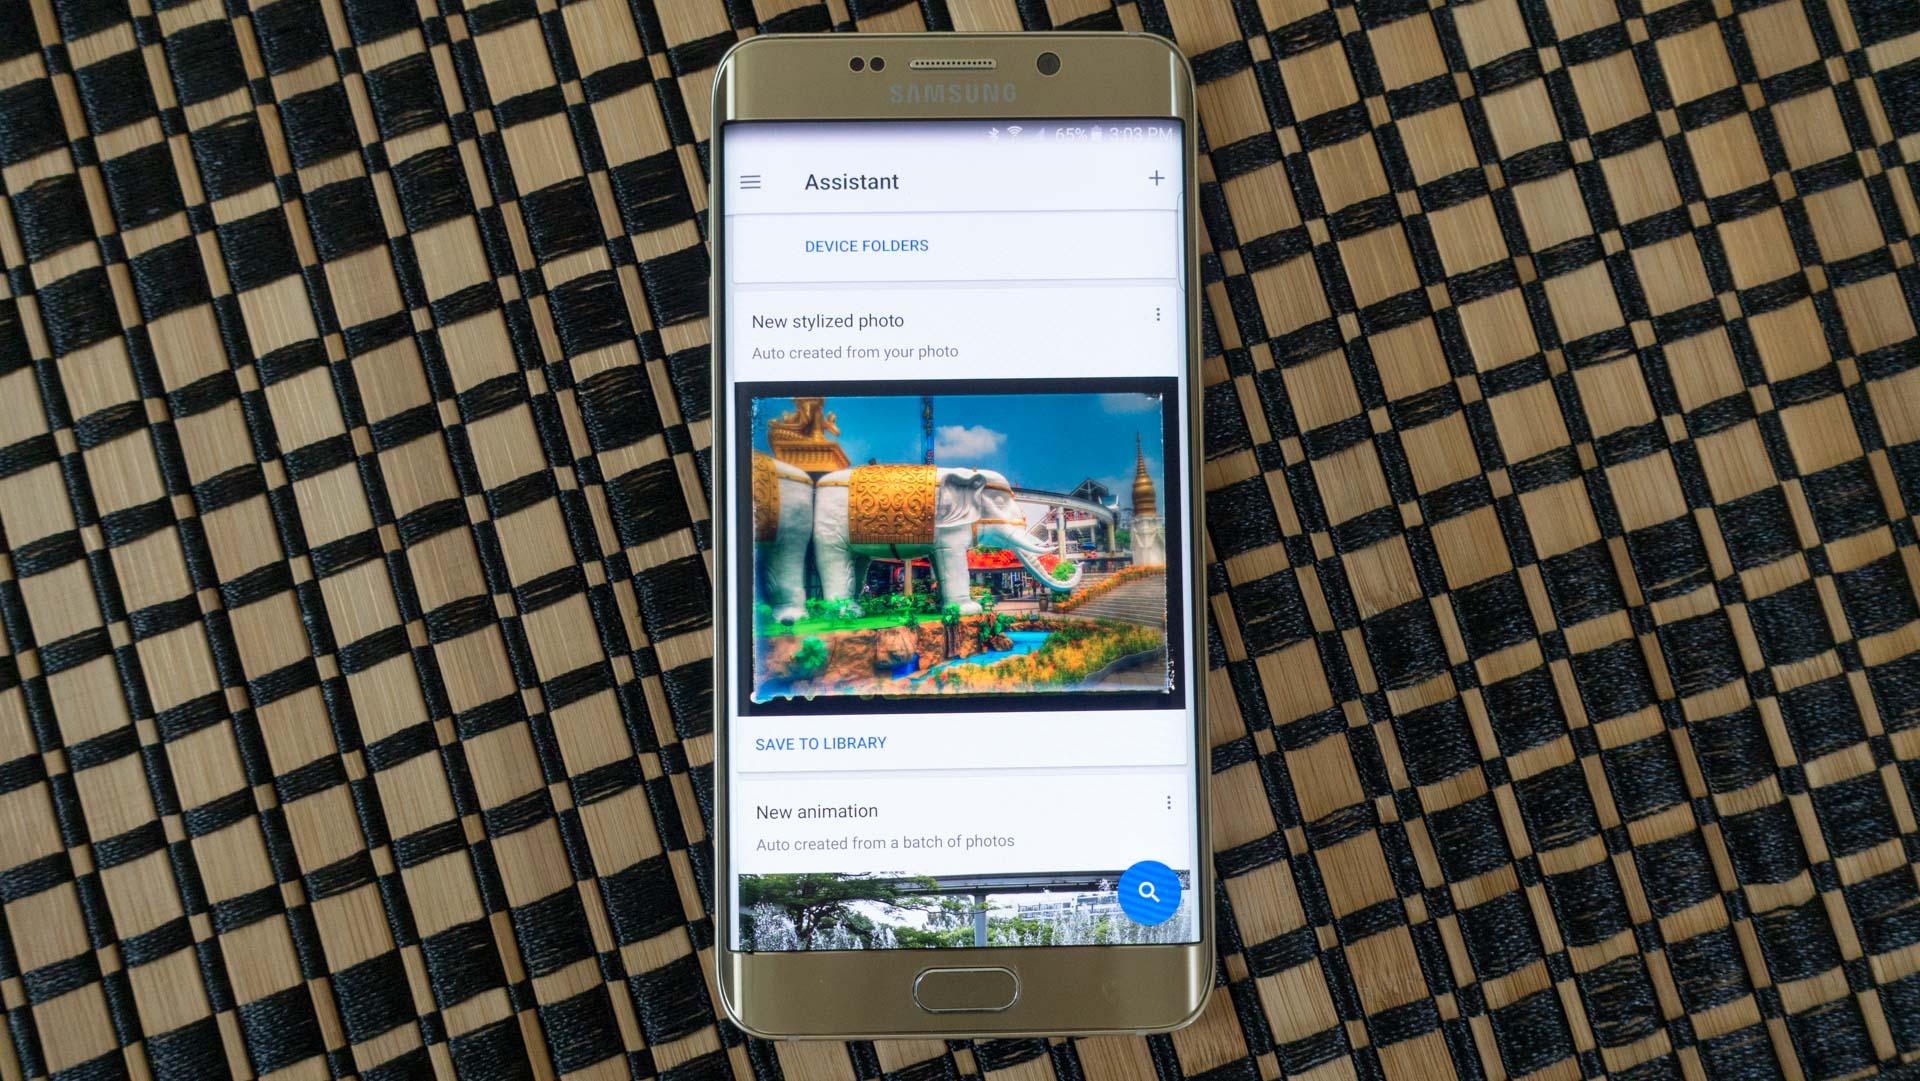 Samsung-Galaxy-S6-Edge-plus-Camera-Tips-Tricks-AH-5